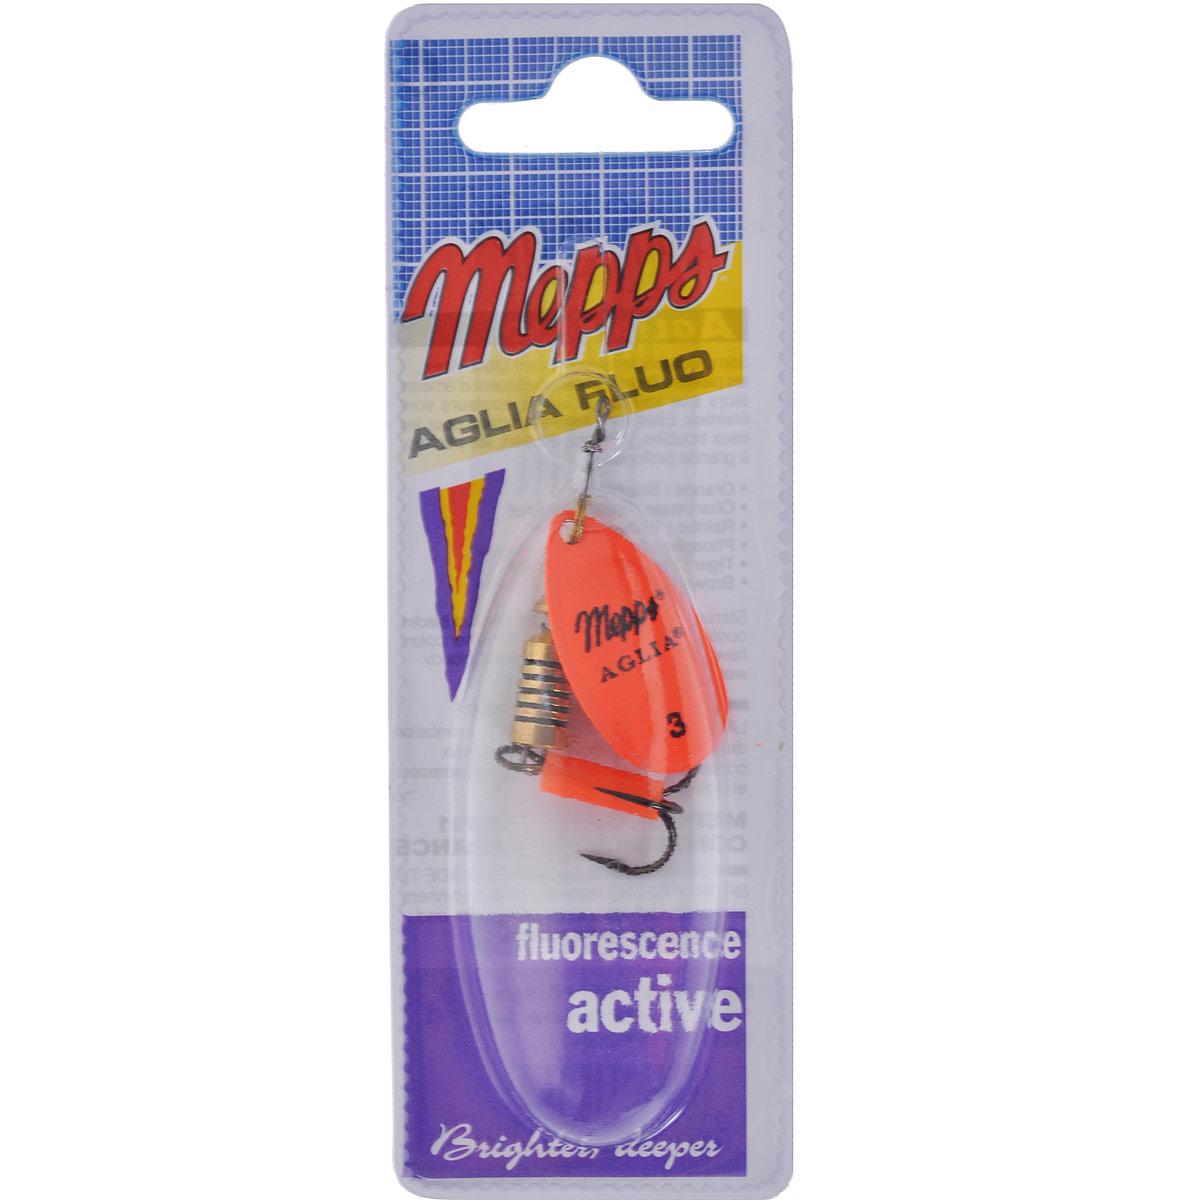 Блесна Mepps Aglia Fluo Orange, вращающаяся, №3